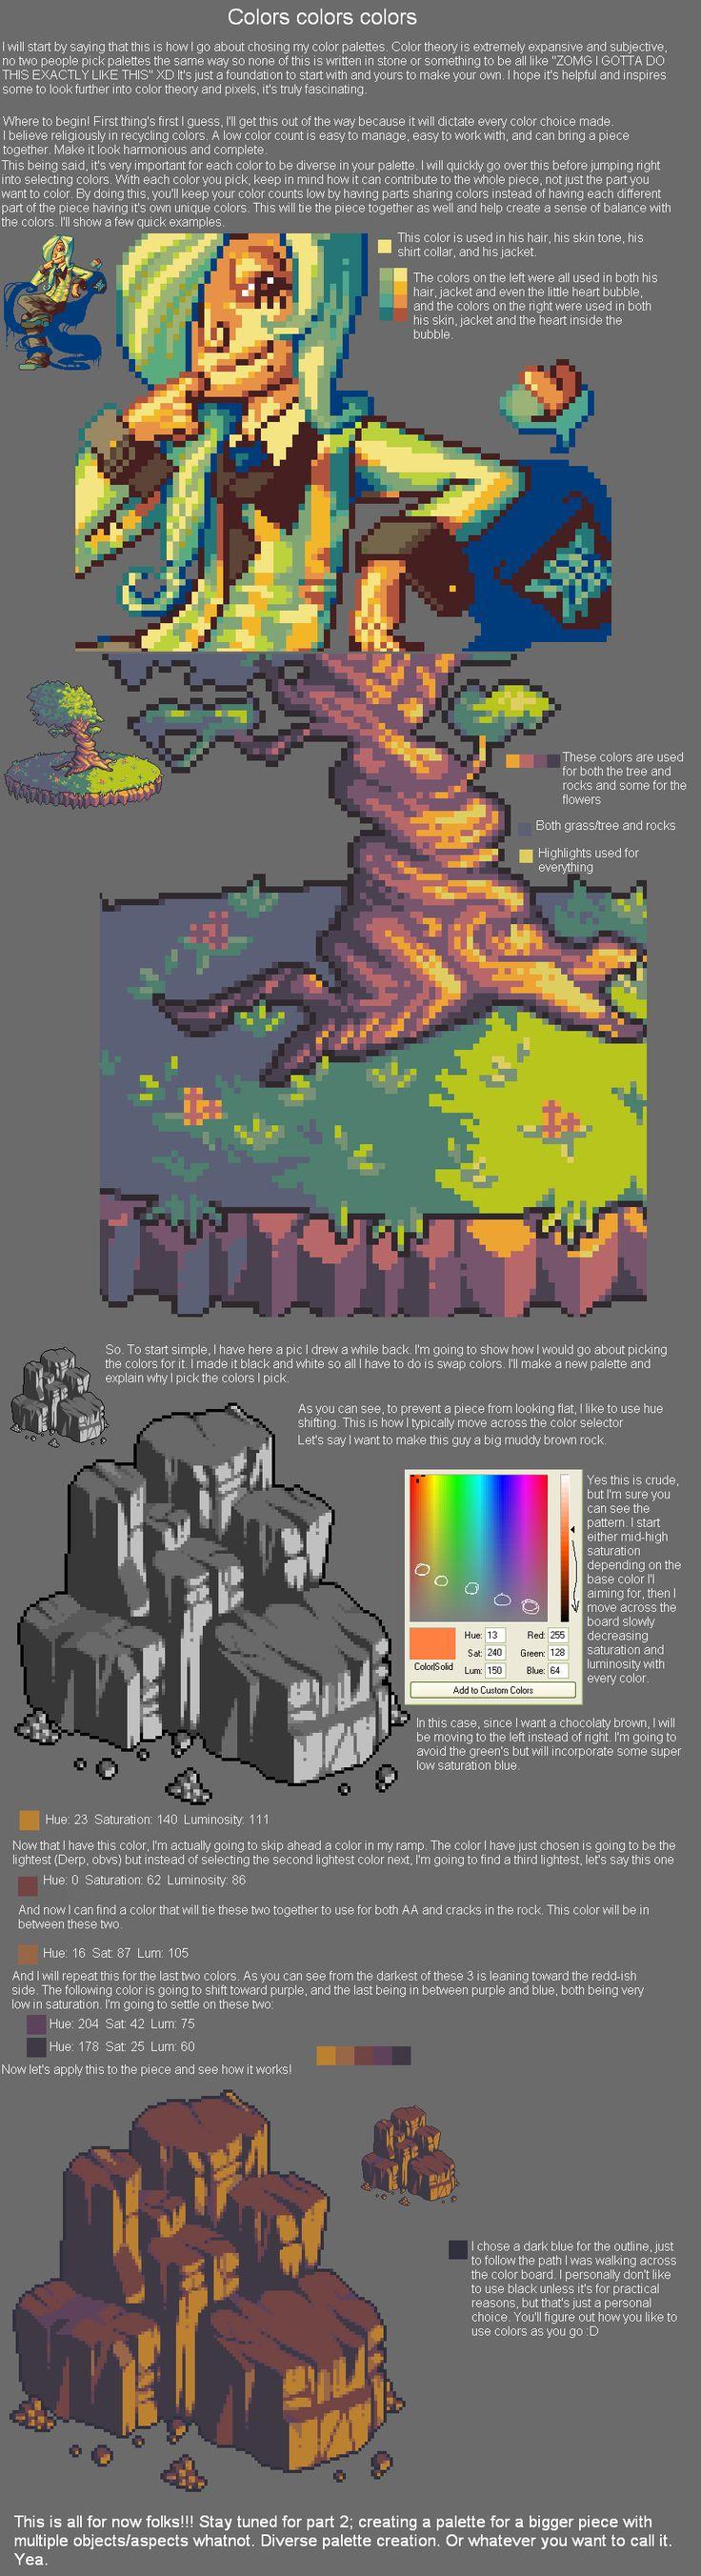 This gif has everything glitch pixel art graphic design vaporwave - Pixel Joint Forum Various Pixel Tutorials